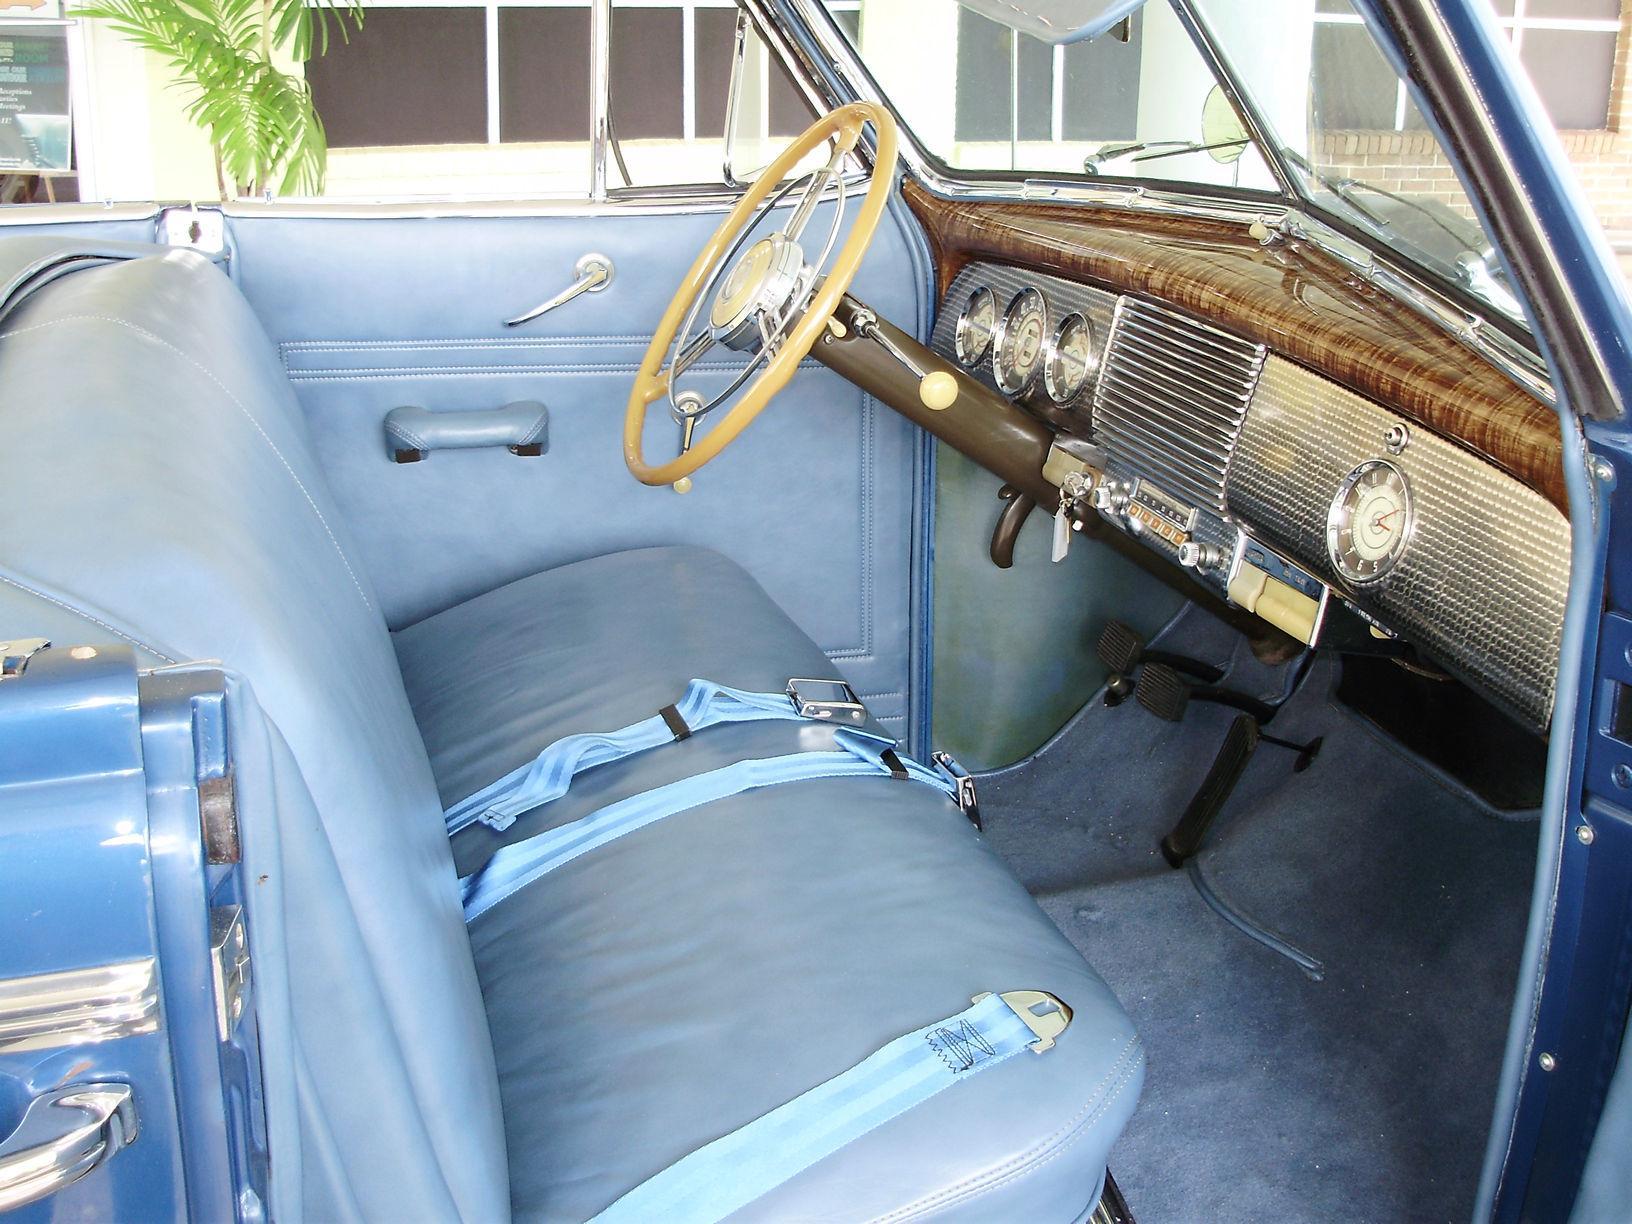 1940 BUICK CENTURY CONVERTIBLE SEDAN - Vintage Motors of Sarasota Inc. #32